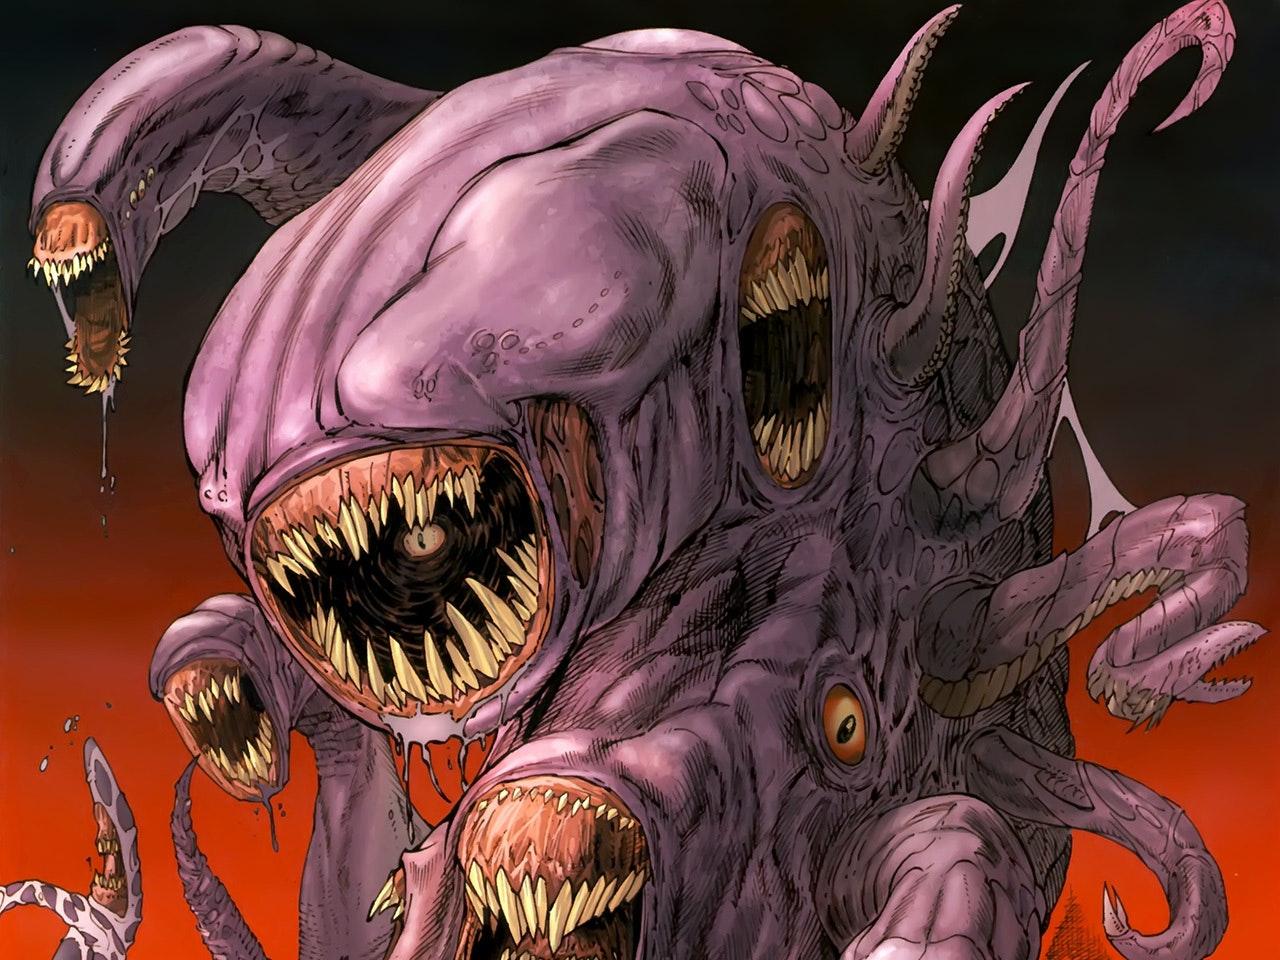 'Guardians Vol. 2' Reveals Possible Lovecraftian Villain